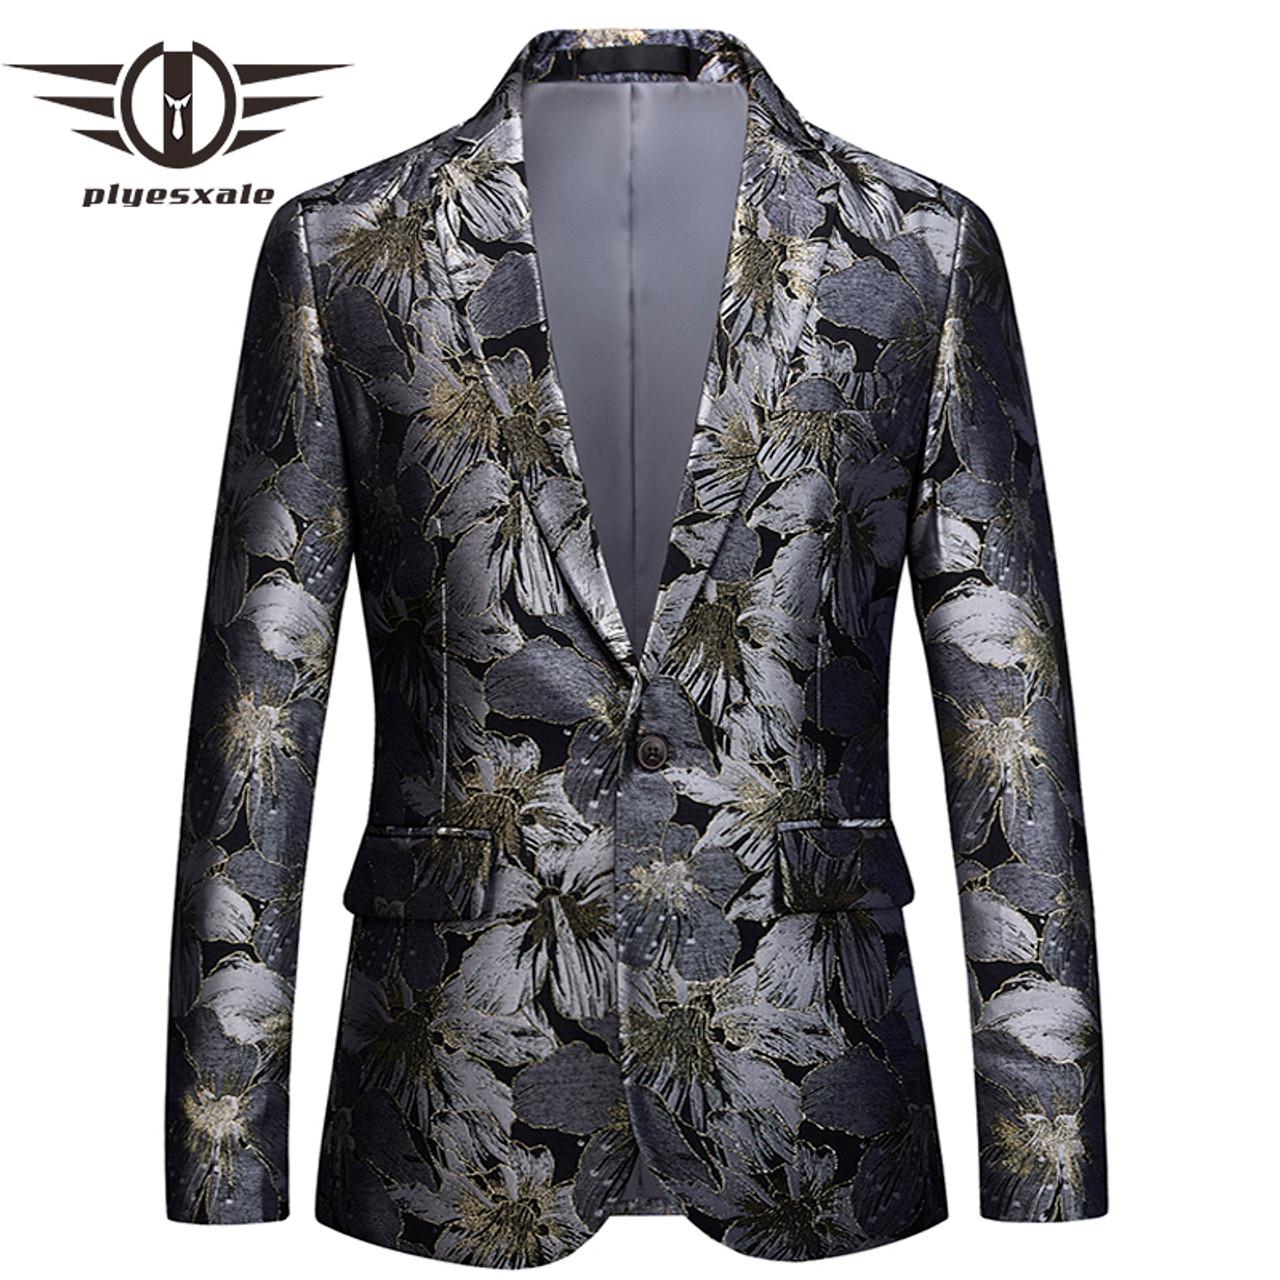 e60282077 Plyesxale Floral Blazer Men 2018 Brand Clothing Mens Blazer Slim Fit Suit  Jacket 5XL 6XL Men's Prom Party Blazers Man Coat Q393